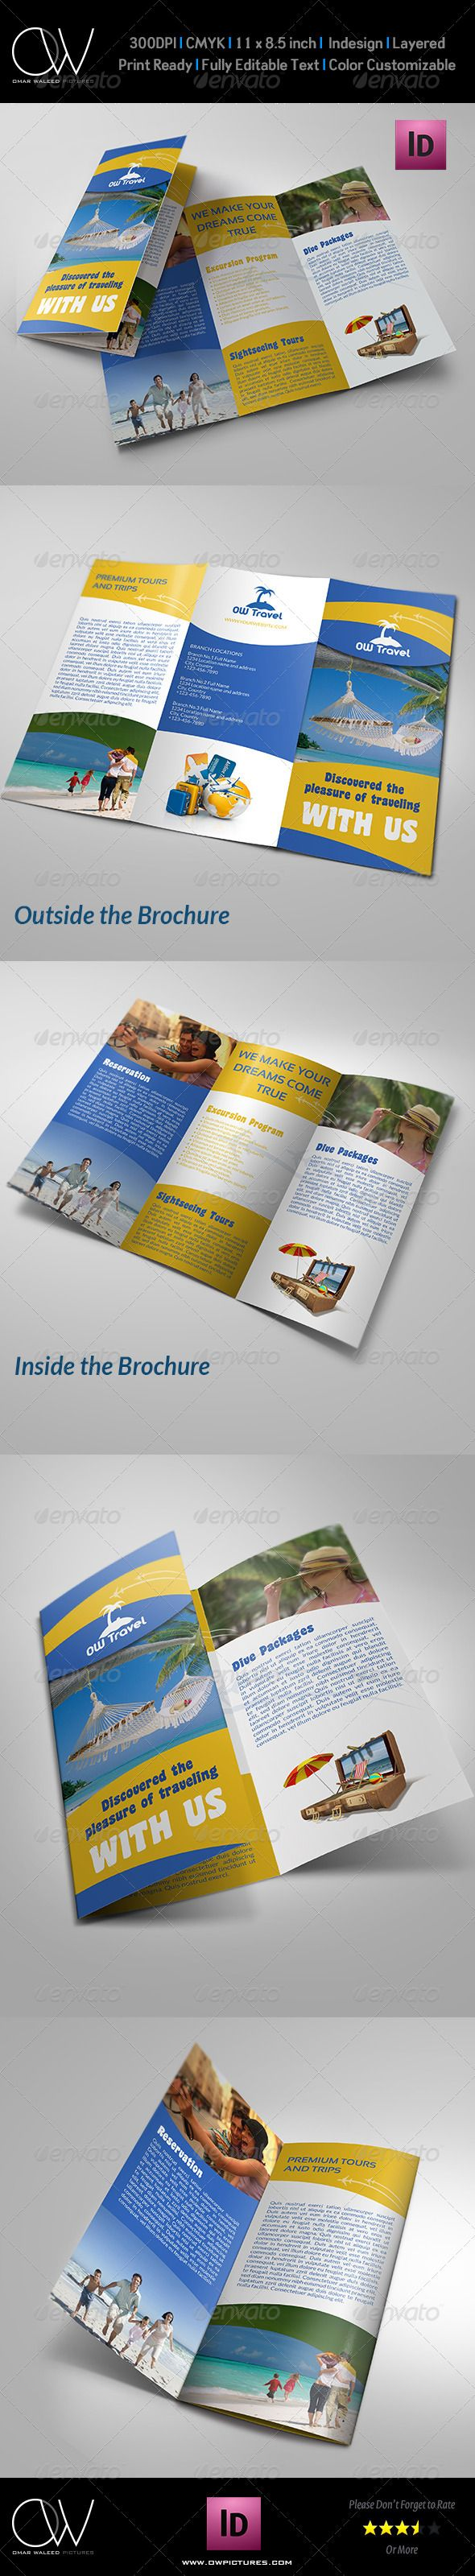 The 25 best tri fold ideas on pinterest tri fold for Tri fold travel brochure template